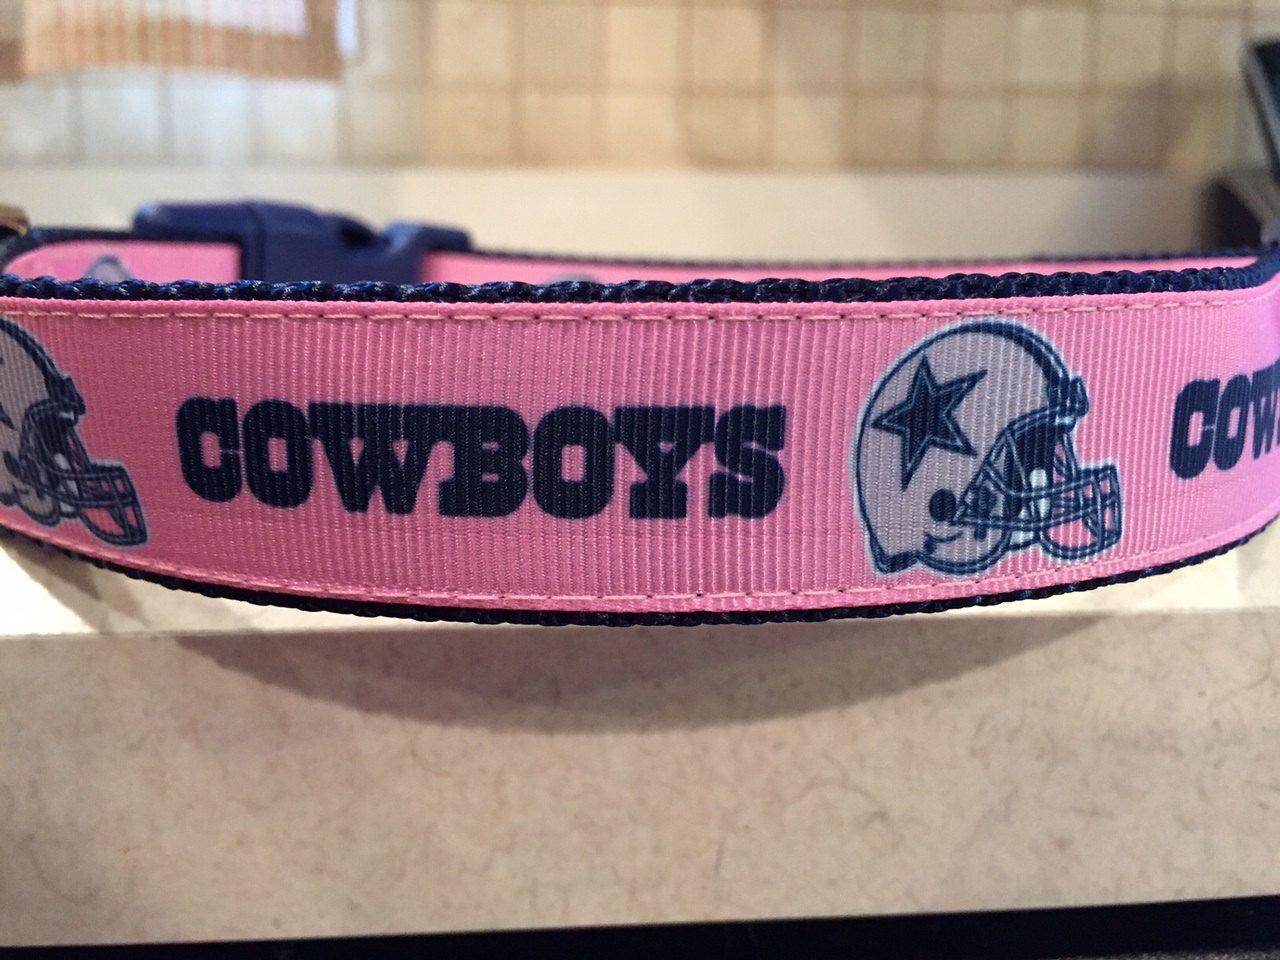 Dallas cowboys pink large and medium dog collar and leash